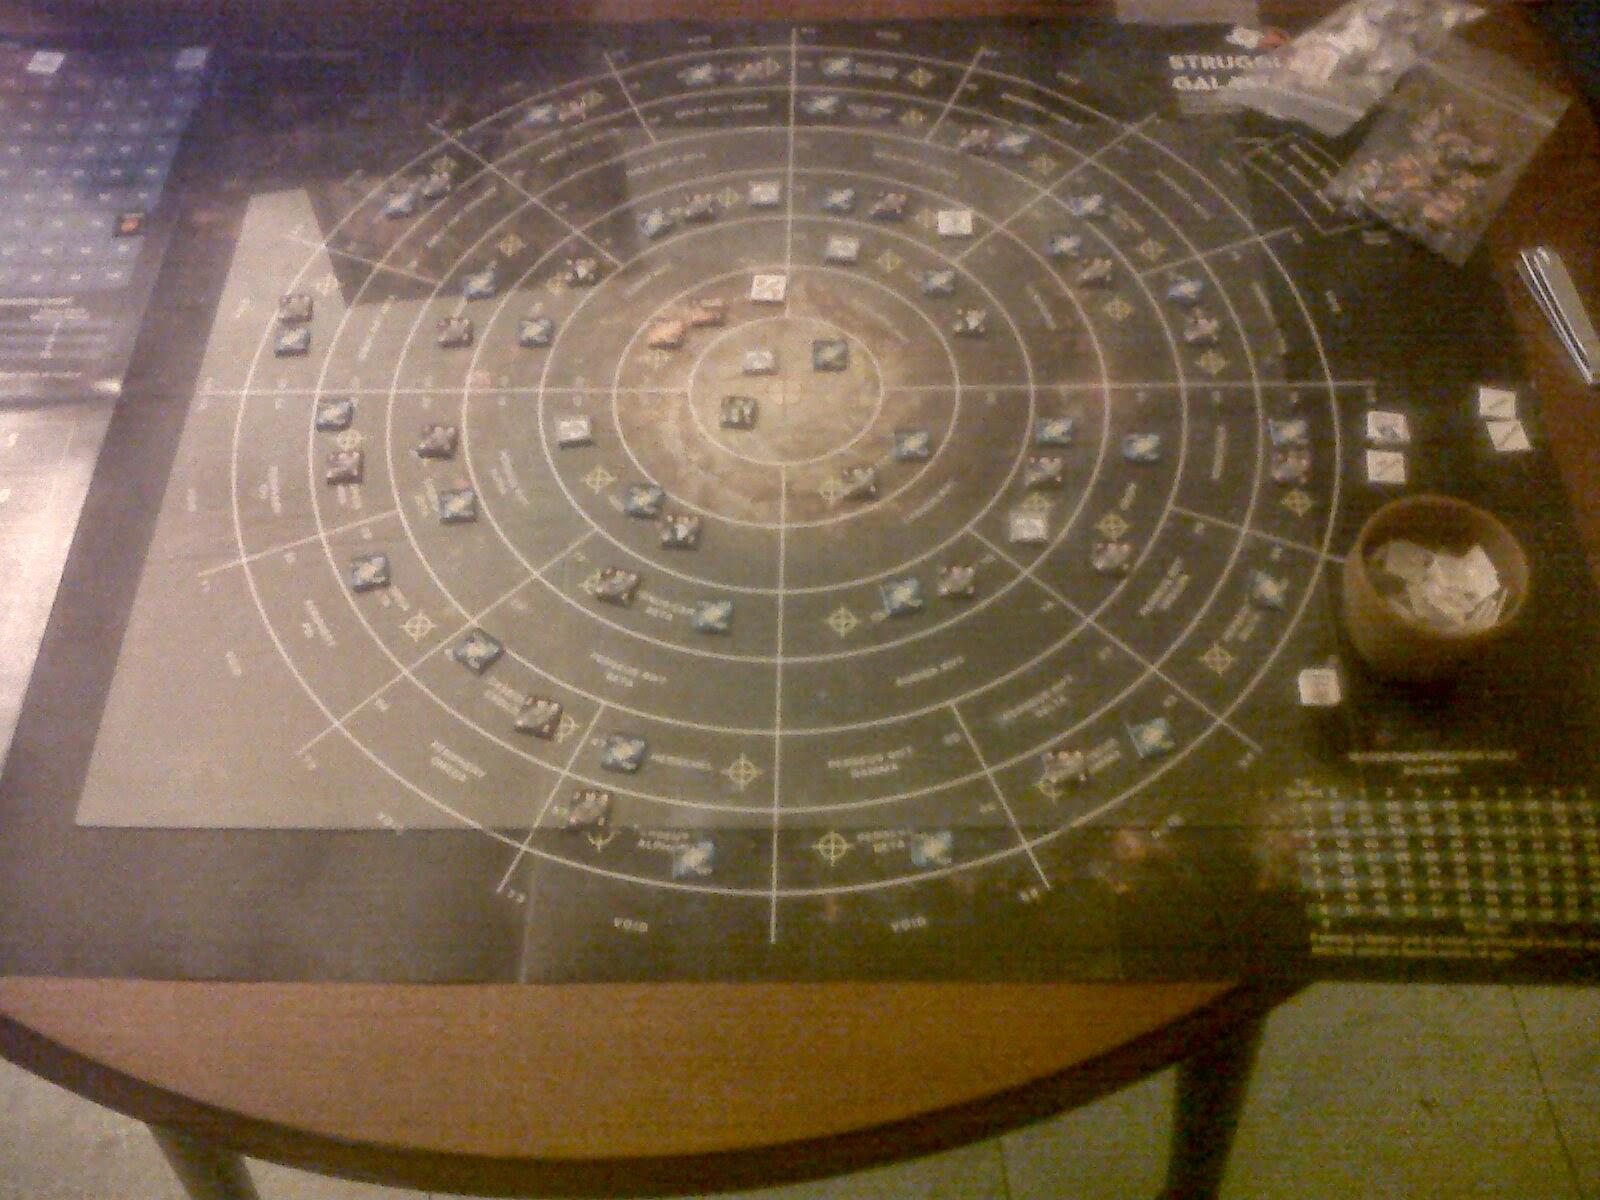 Struggle for the Galactic Empire: Primer acercamiento